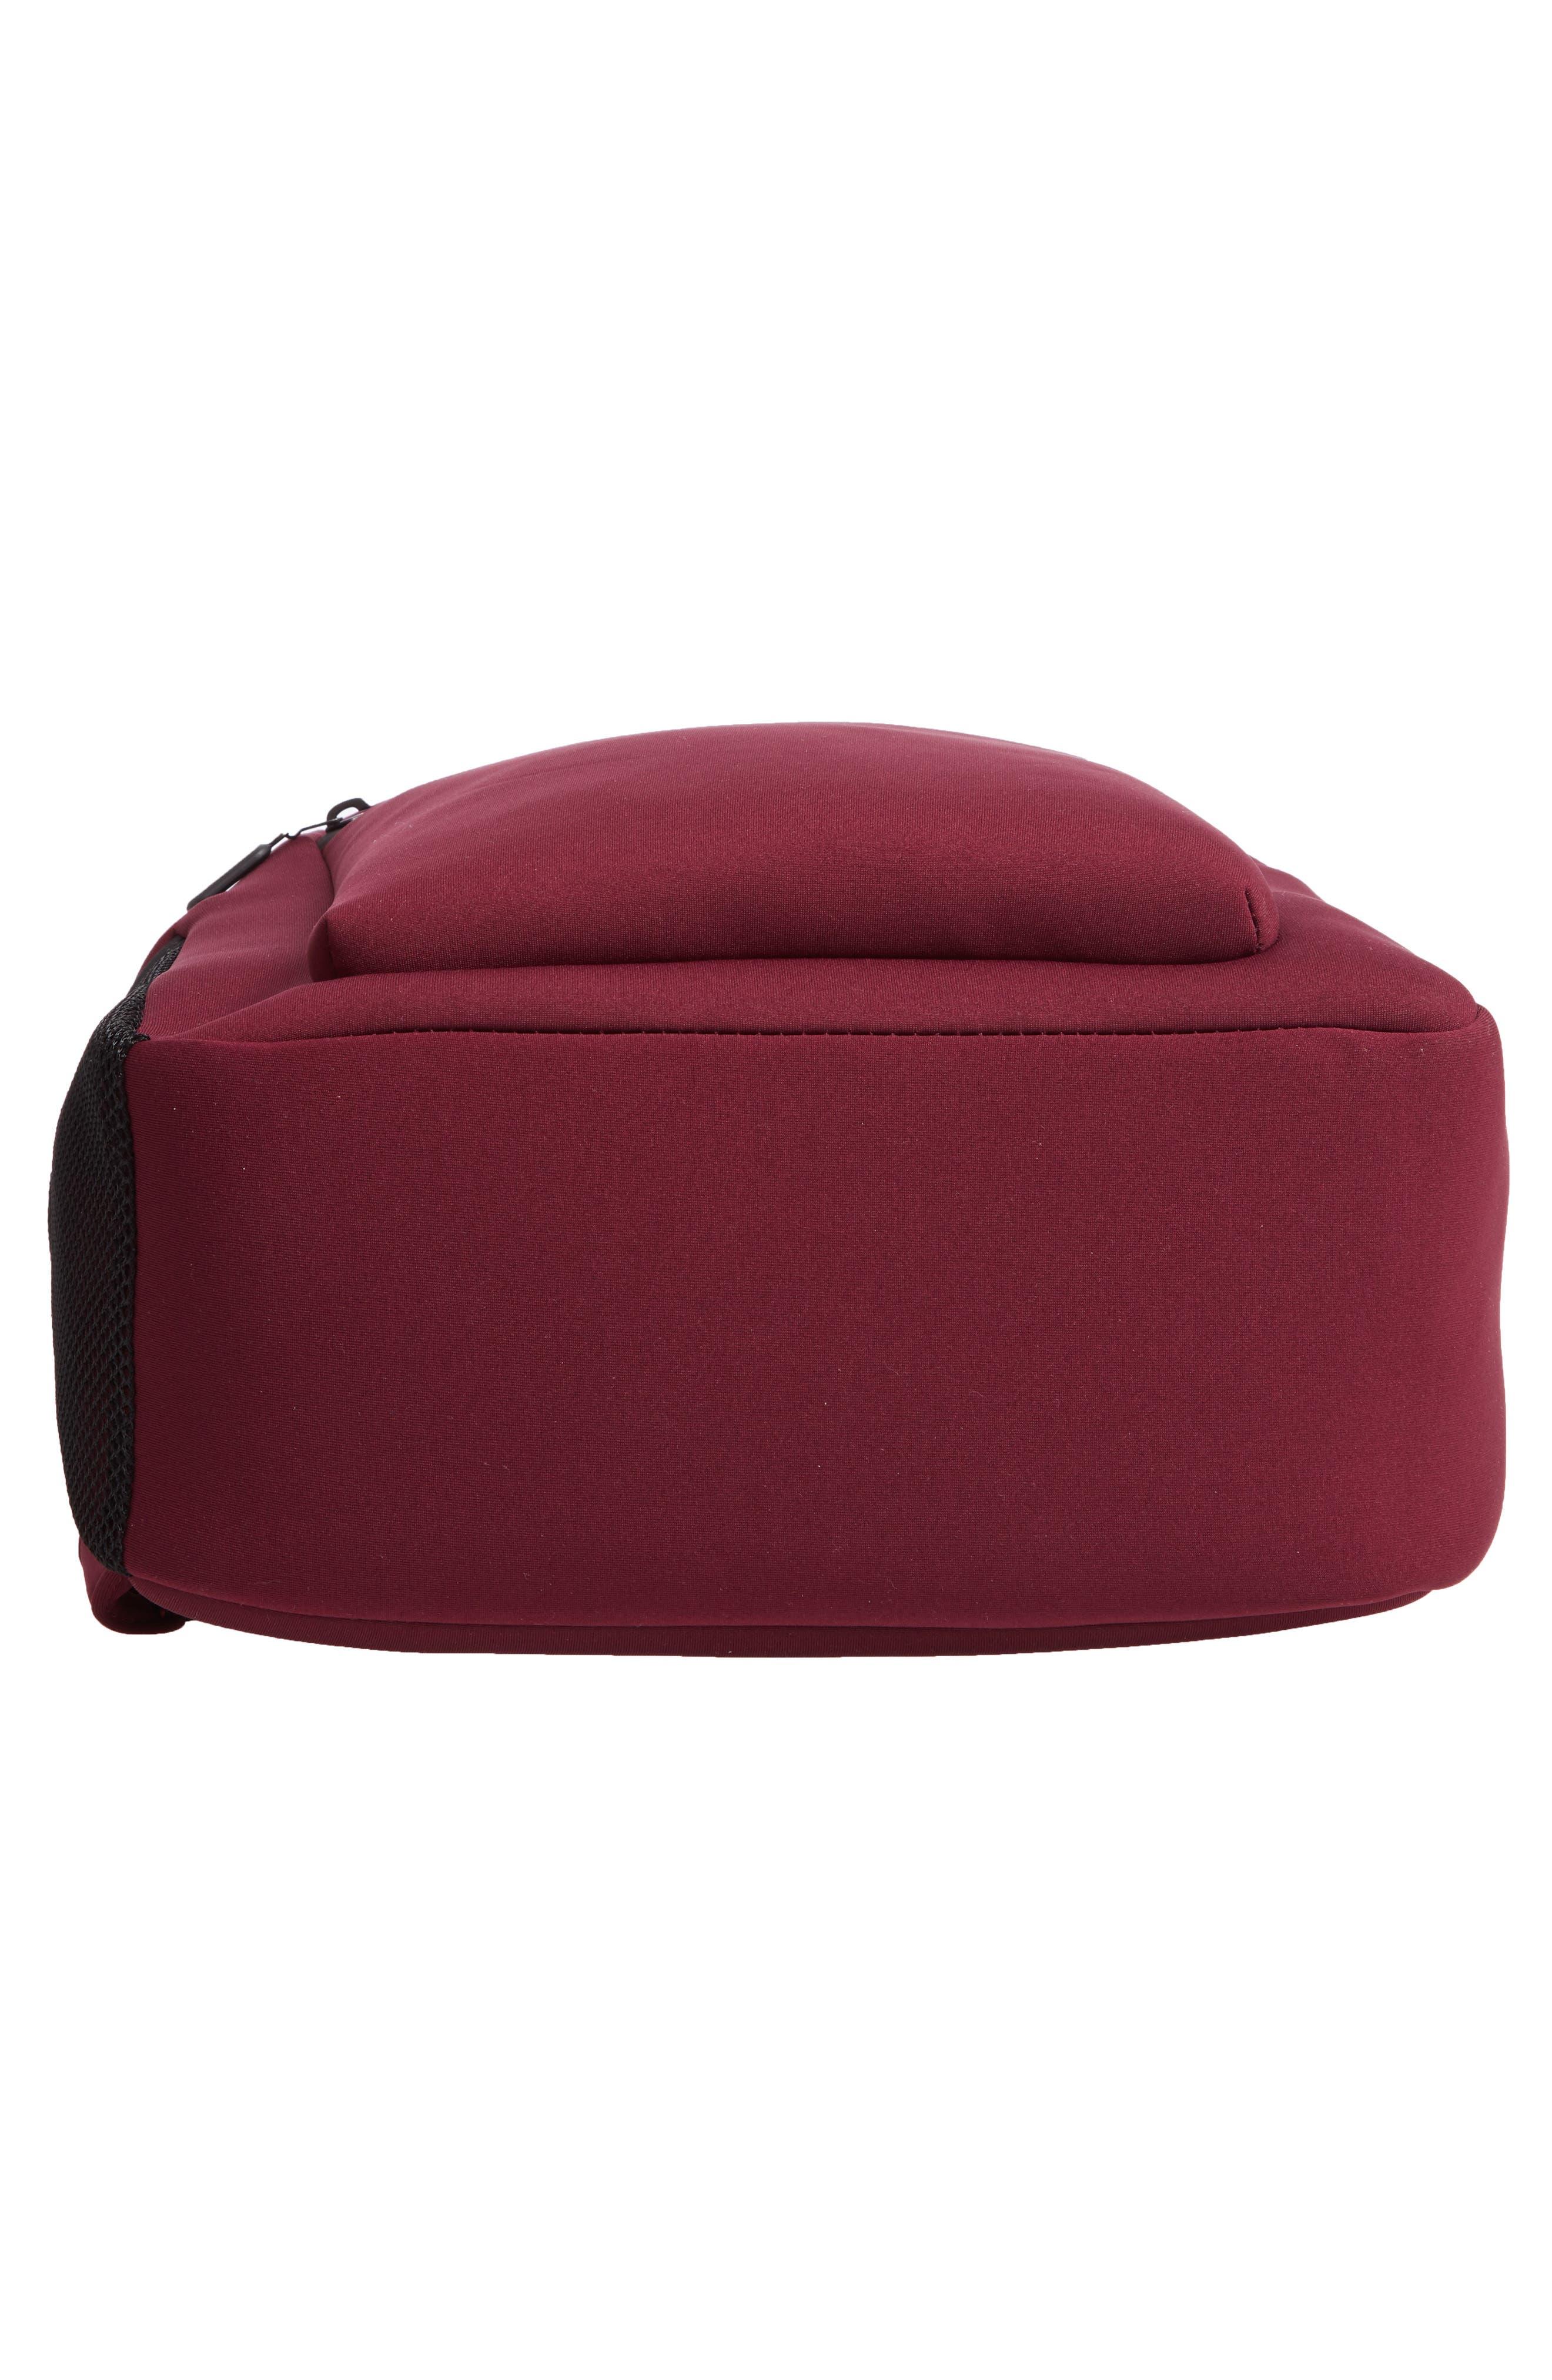 Baseline Backpack,                             Alternate thumbnail 6, color,                             RED TANNIN